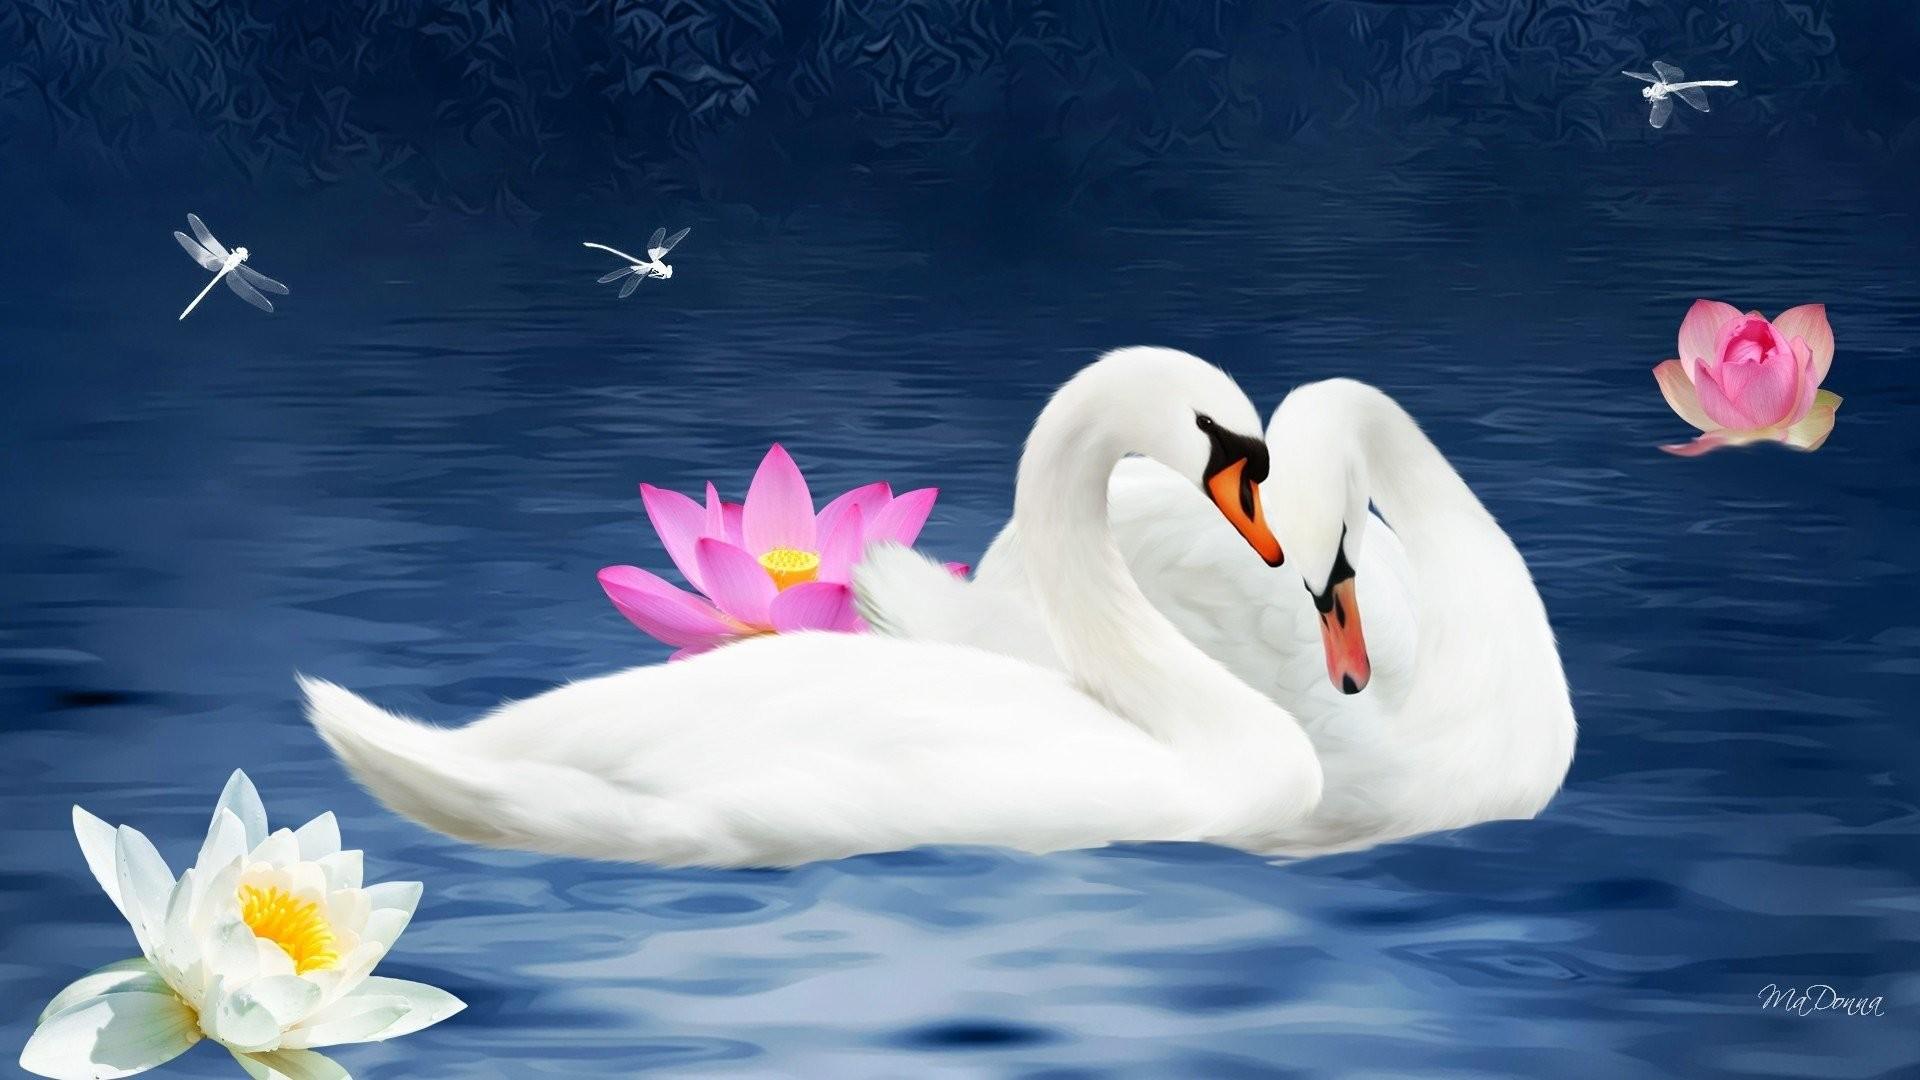 Lovely birds wallpaper wallpapertag - Swan wallpapers for desktop ...